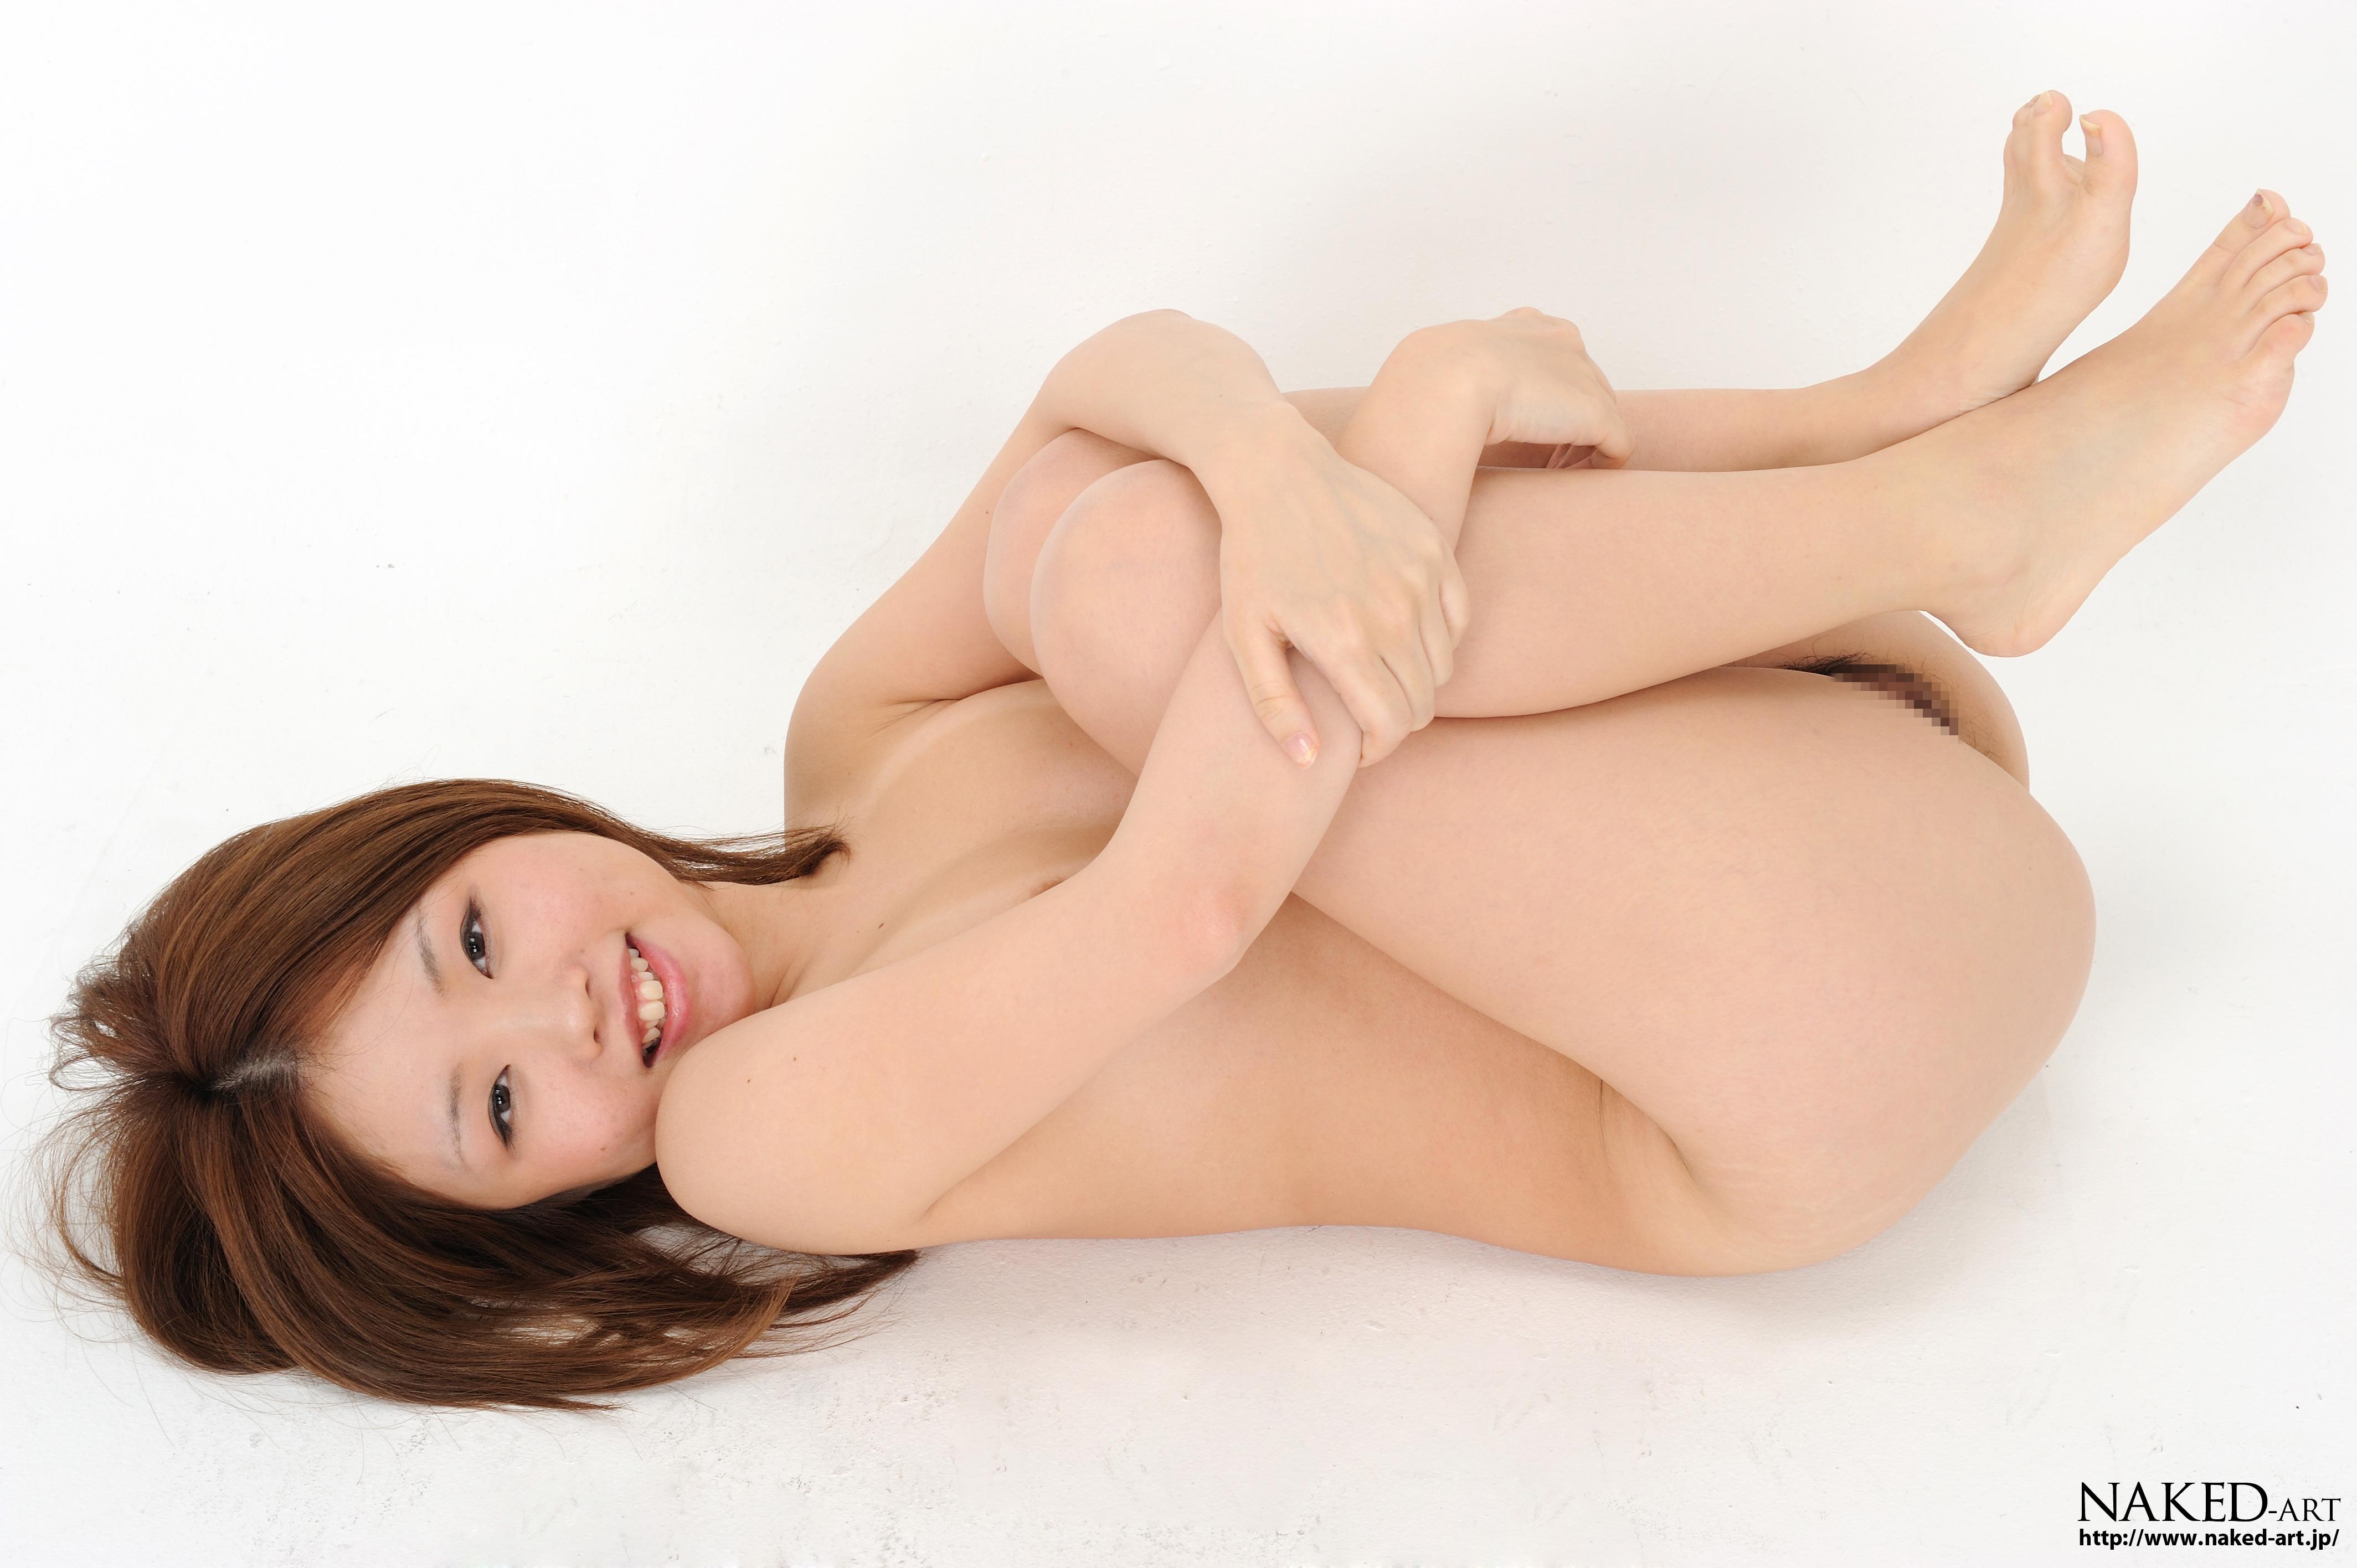 Japanese Gravure - Free Hd Photography Of Beautiful Girls -2539